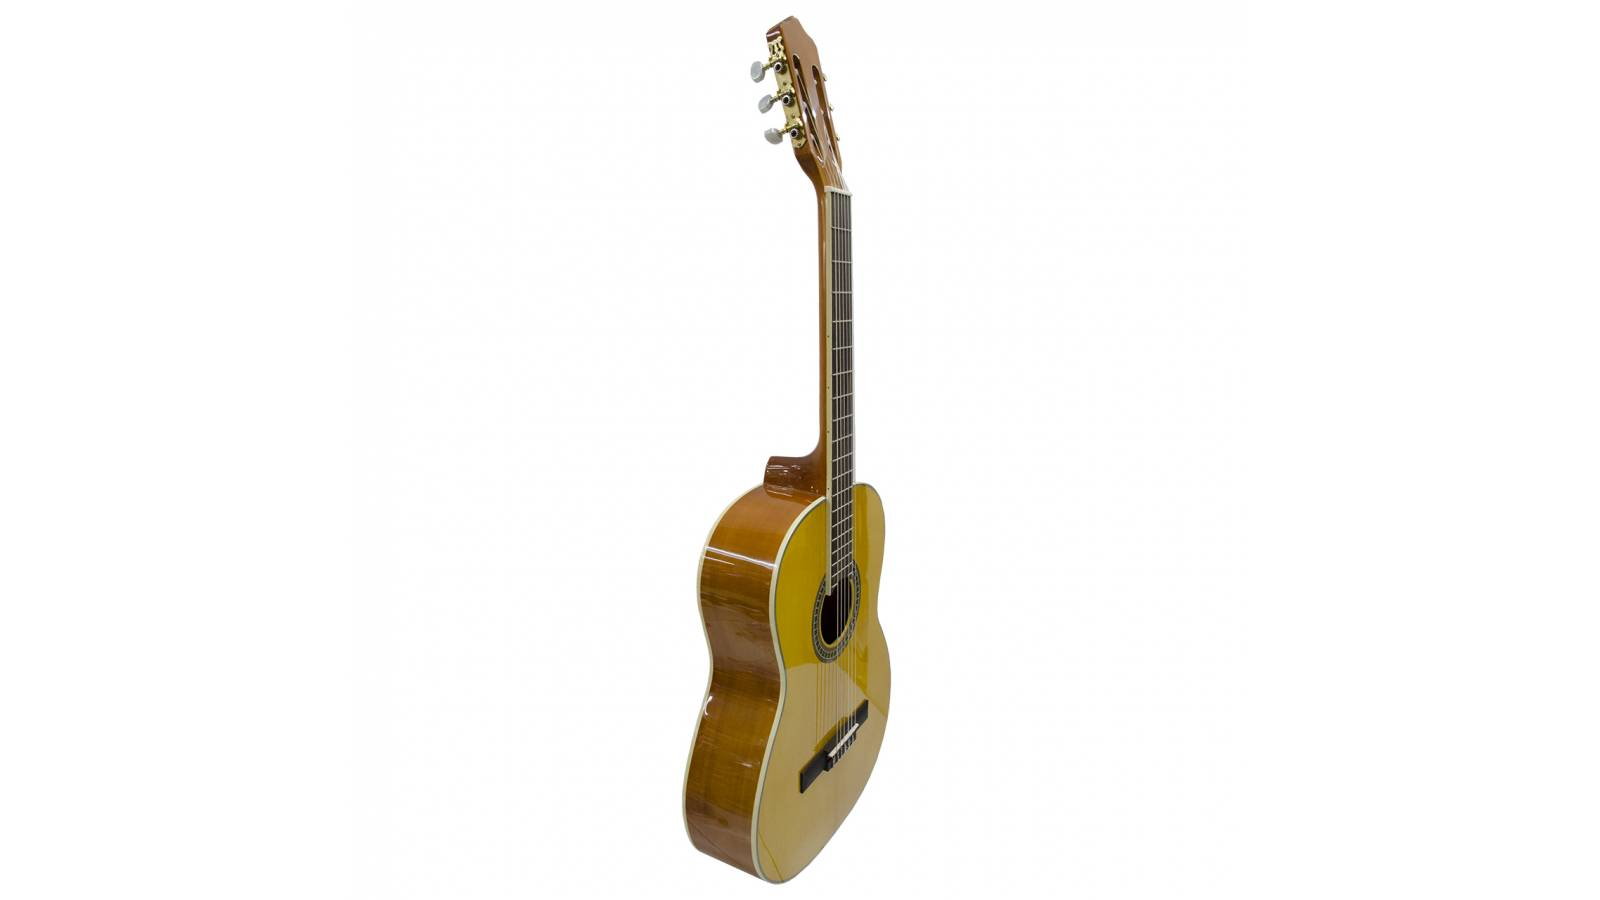 Guitarra Clásica 39 pulgadas